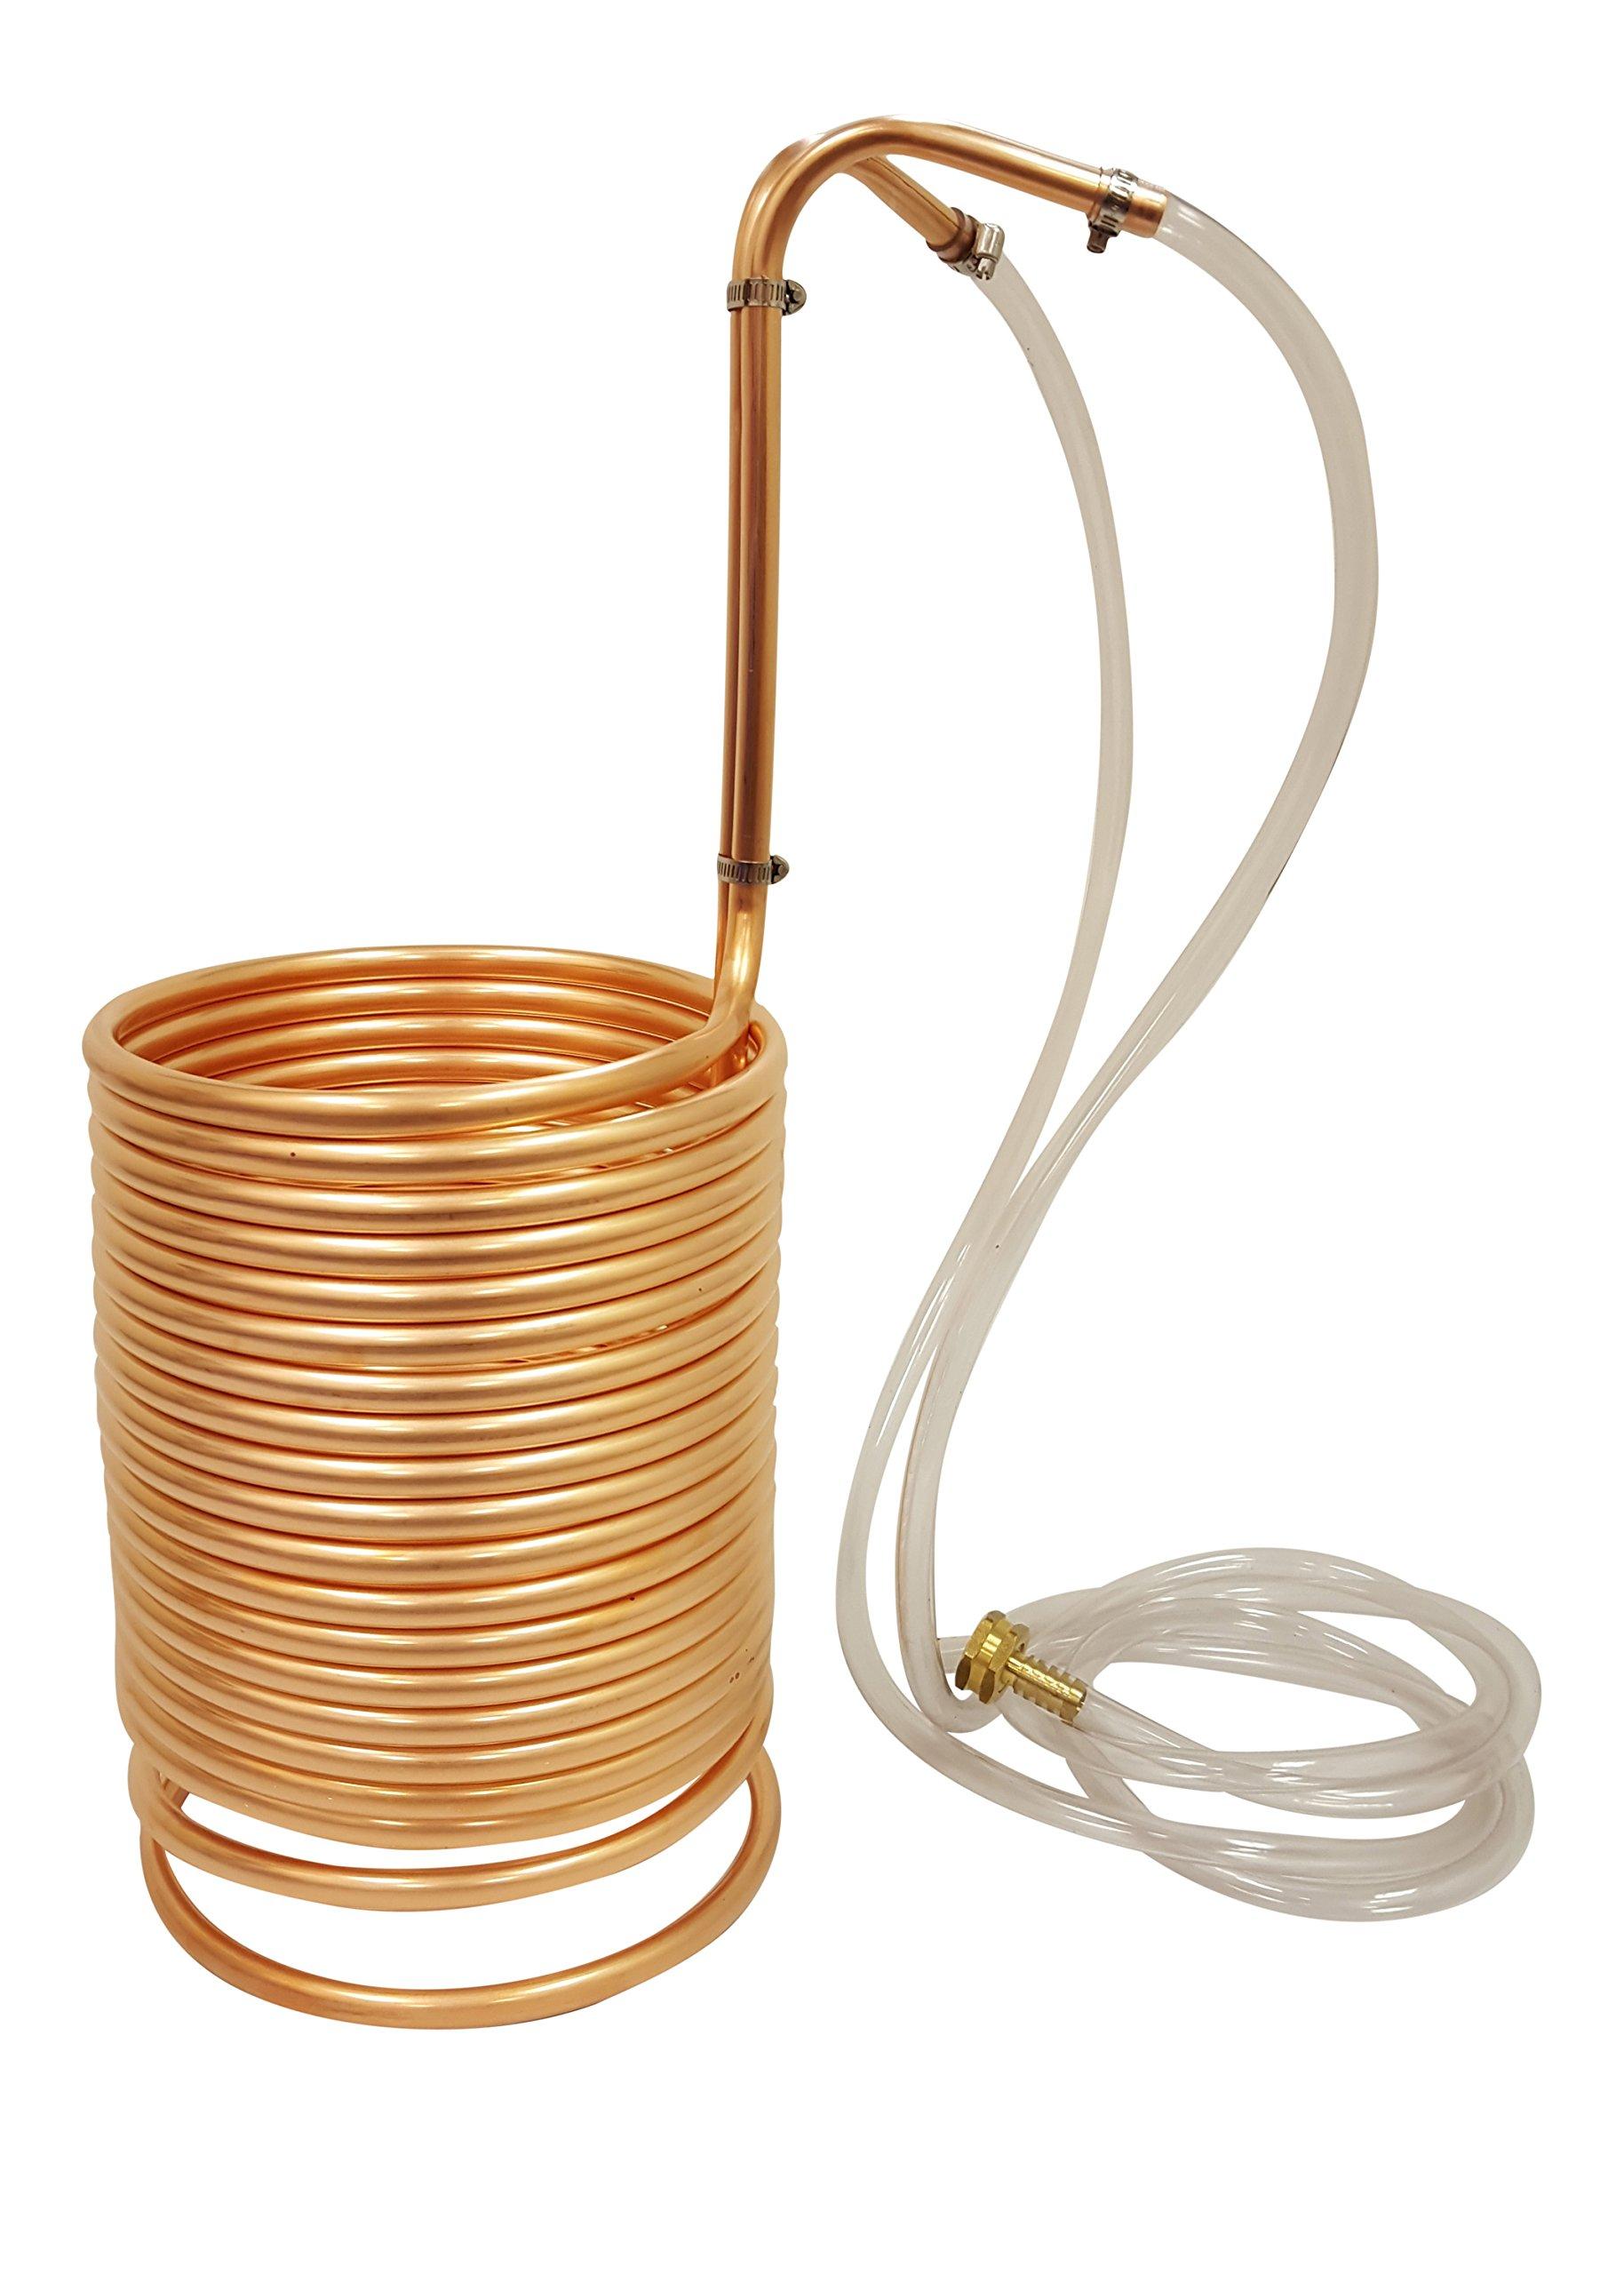 NY Brew Supply Wort Chiller w/vinyl tubing attachments, 1/2'' x 50', Copper